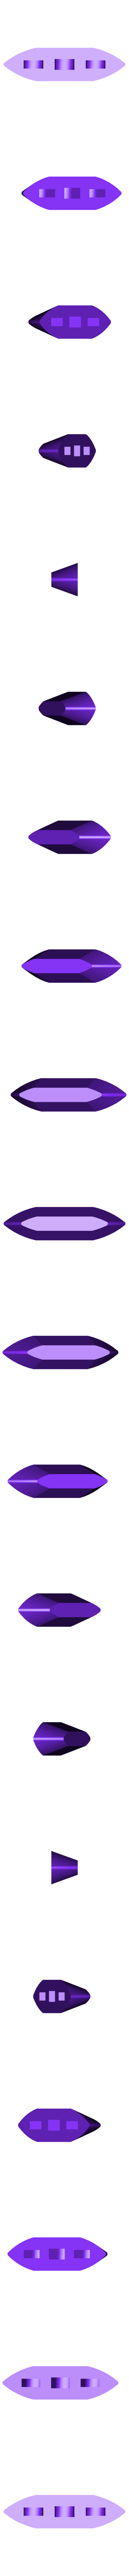 5_Buck_Boat_Base_002.STL Download free STL file 5 BUCK BOAT! • 3D printing object, Tarnliare